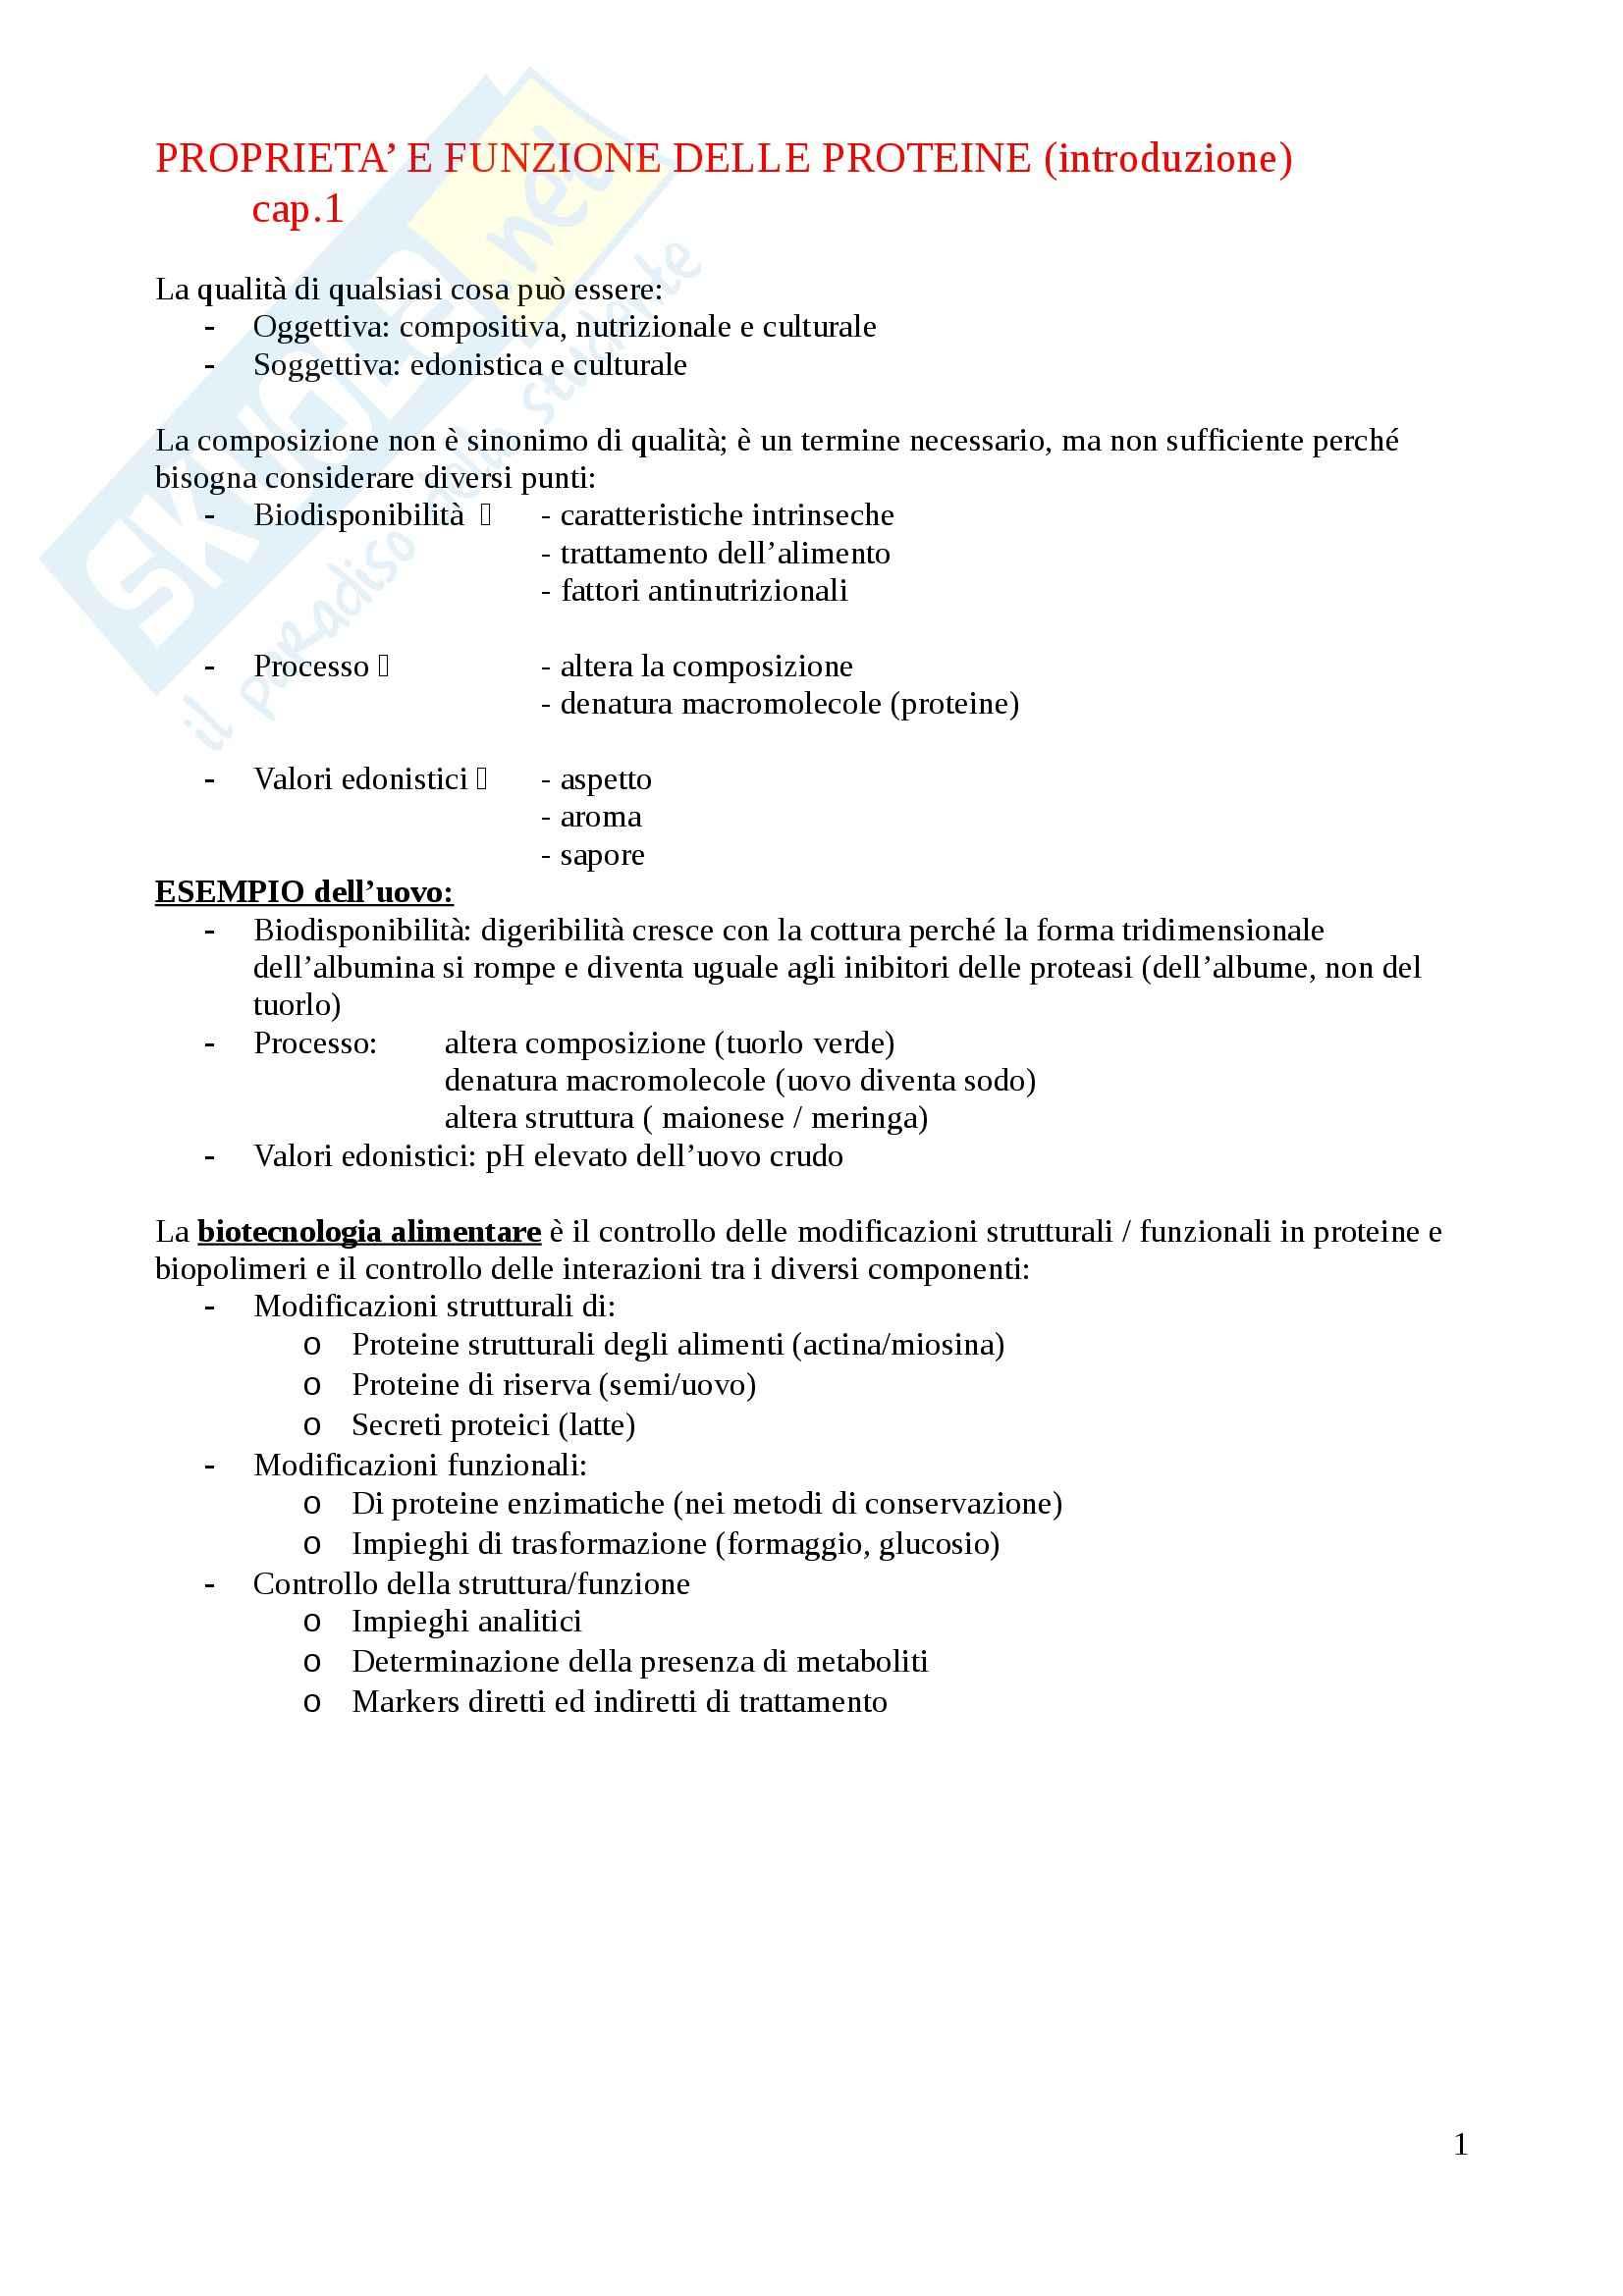 Biochimica alimentare - biochimica alimentare